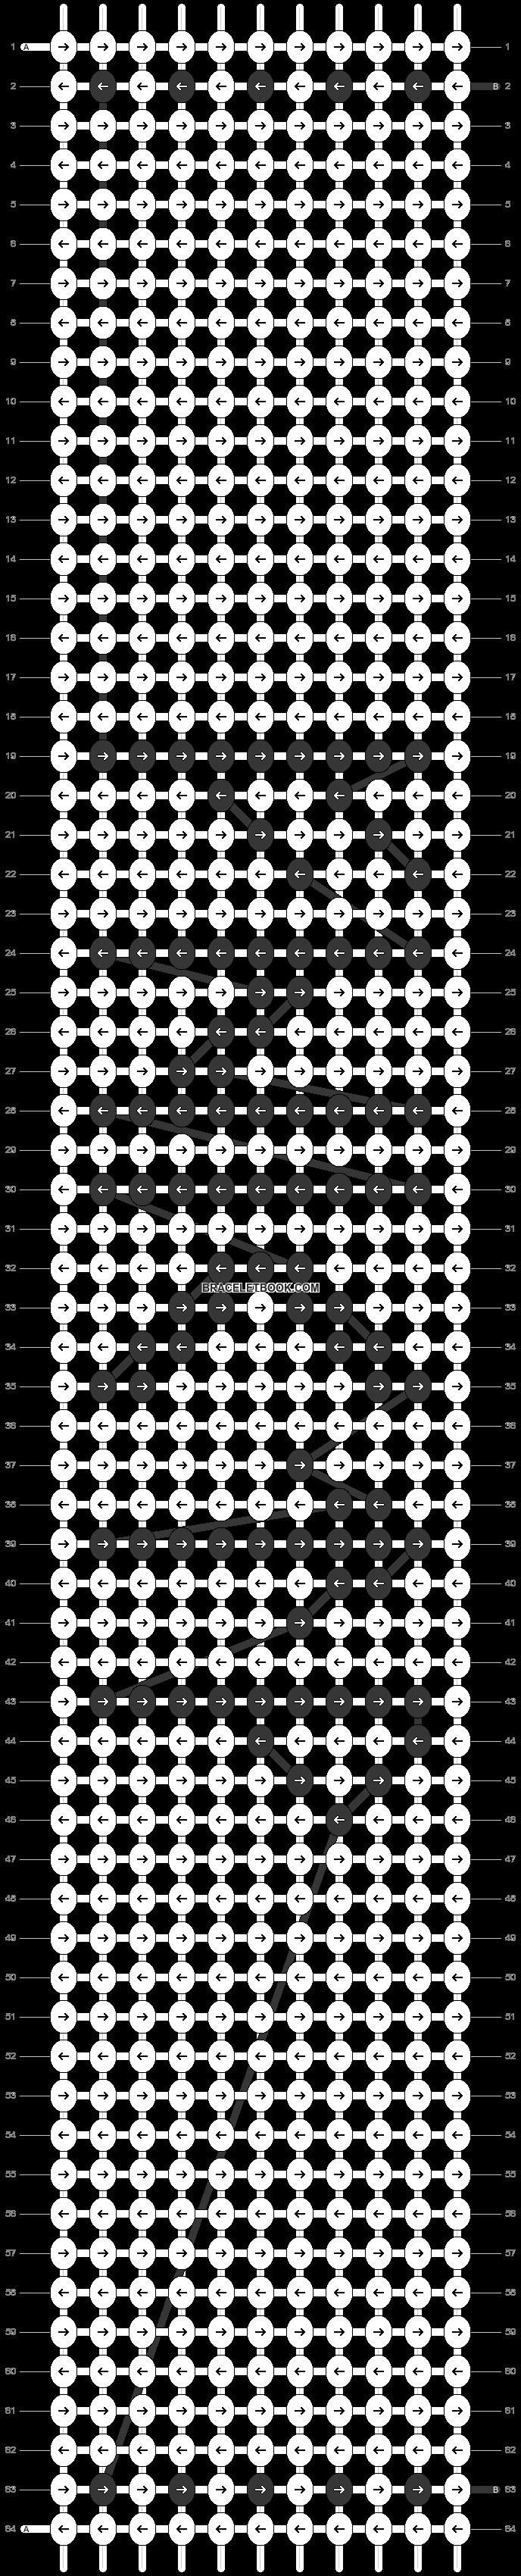 Alpha pattern #42003 pattern